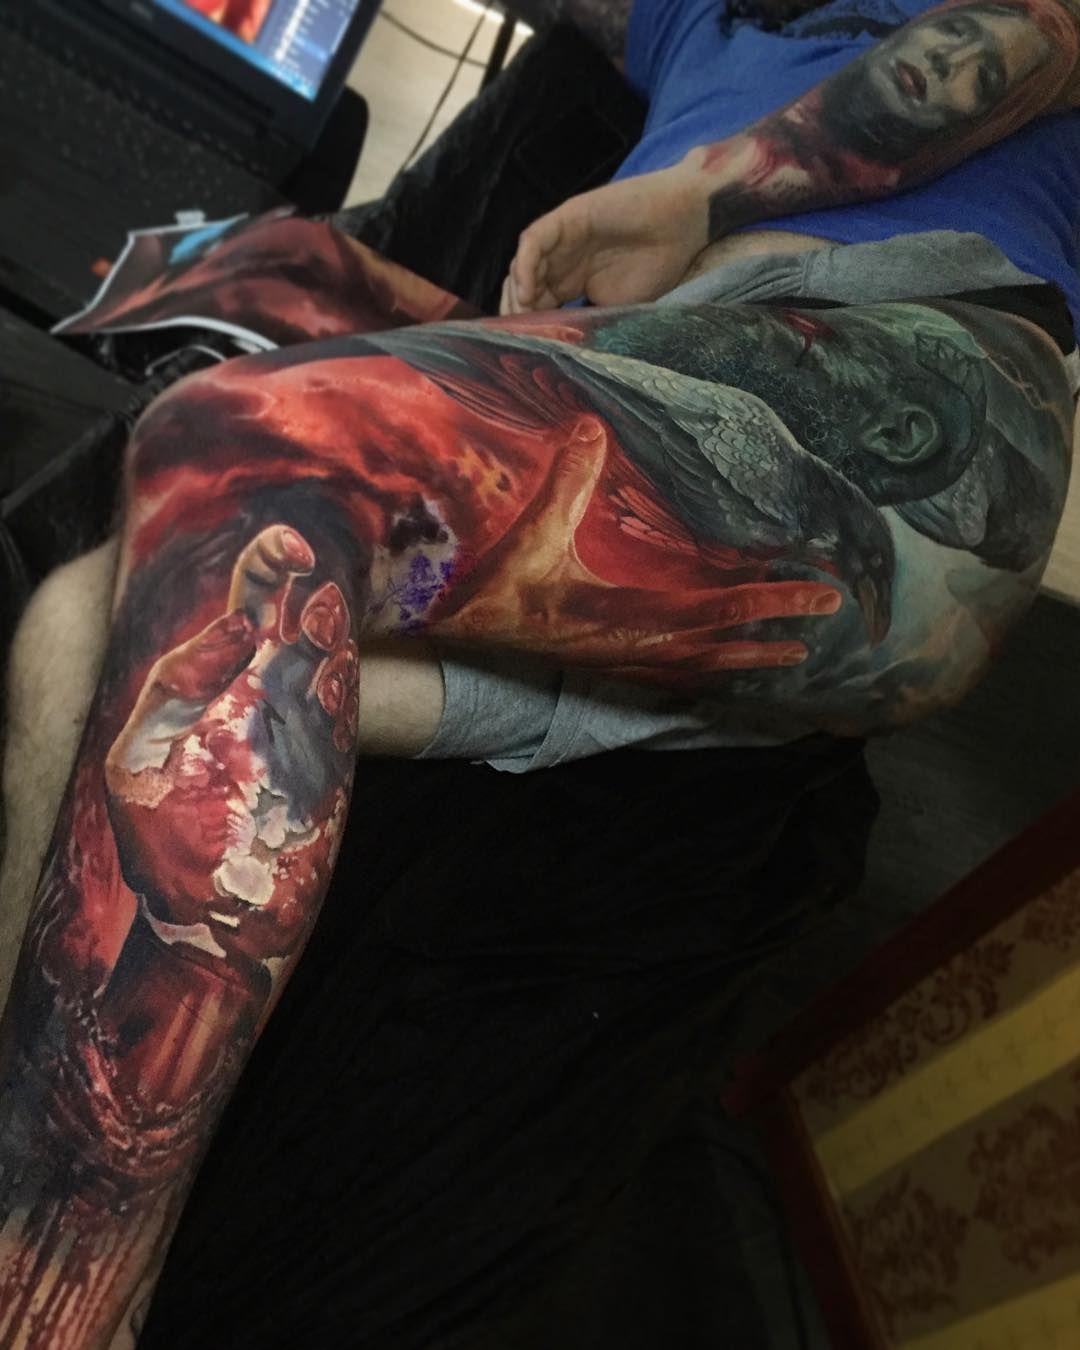 315d9580f Tattoo artist Boris authors black&grey color realistic fantasy tattoo |  Vienna, Austria